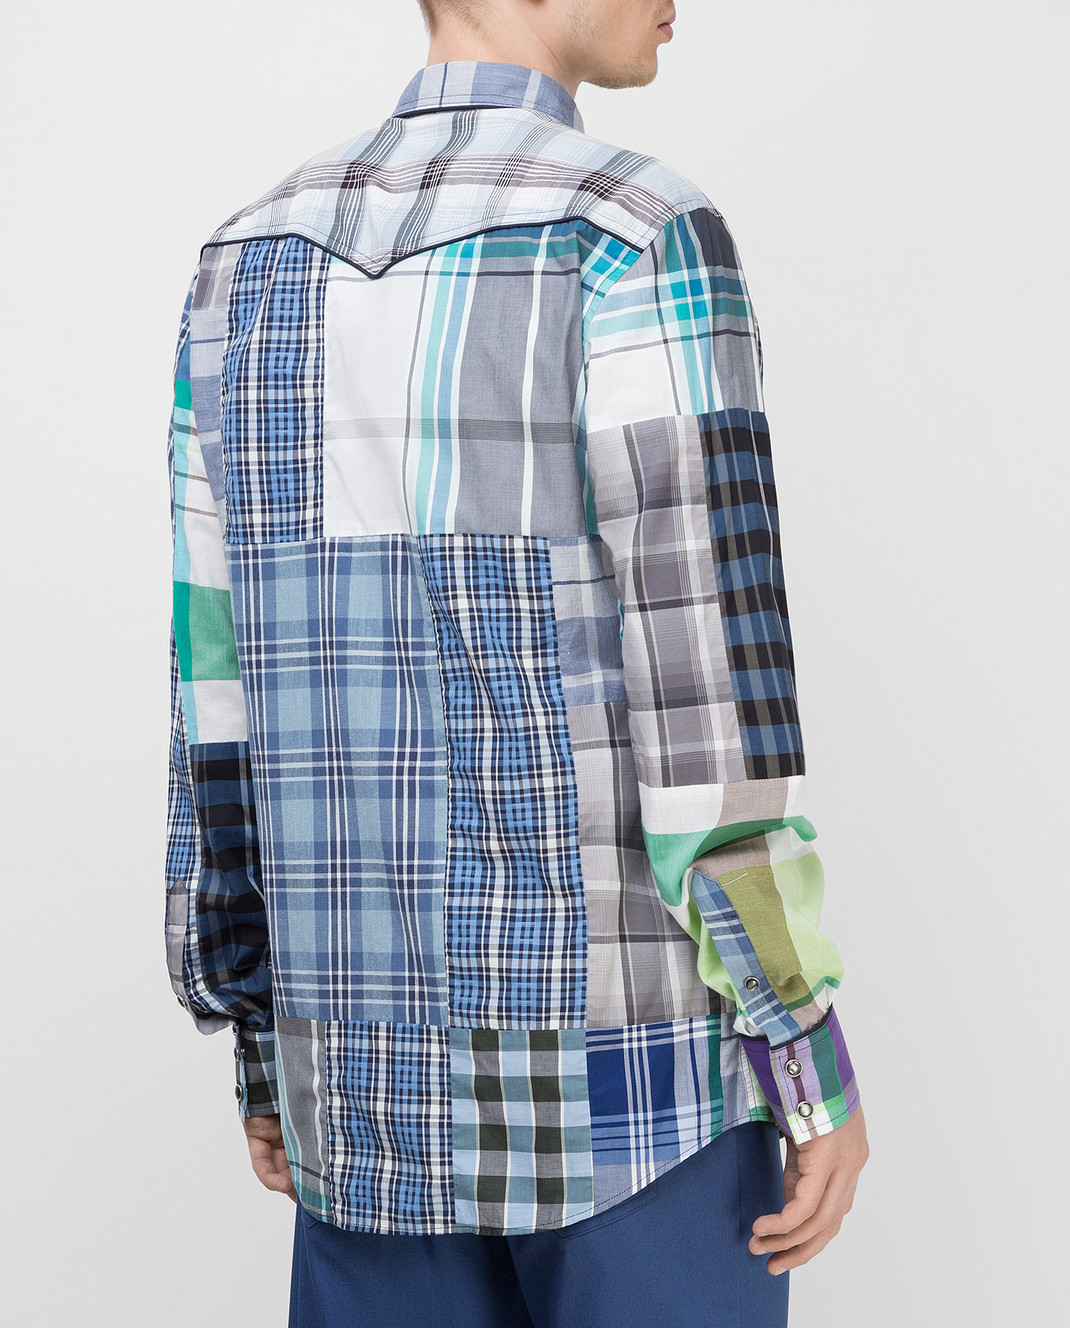 Dolce&Gabbana Синяя рубашка изображение 4